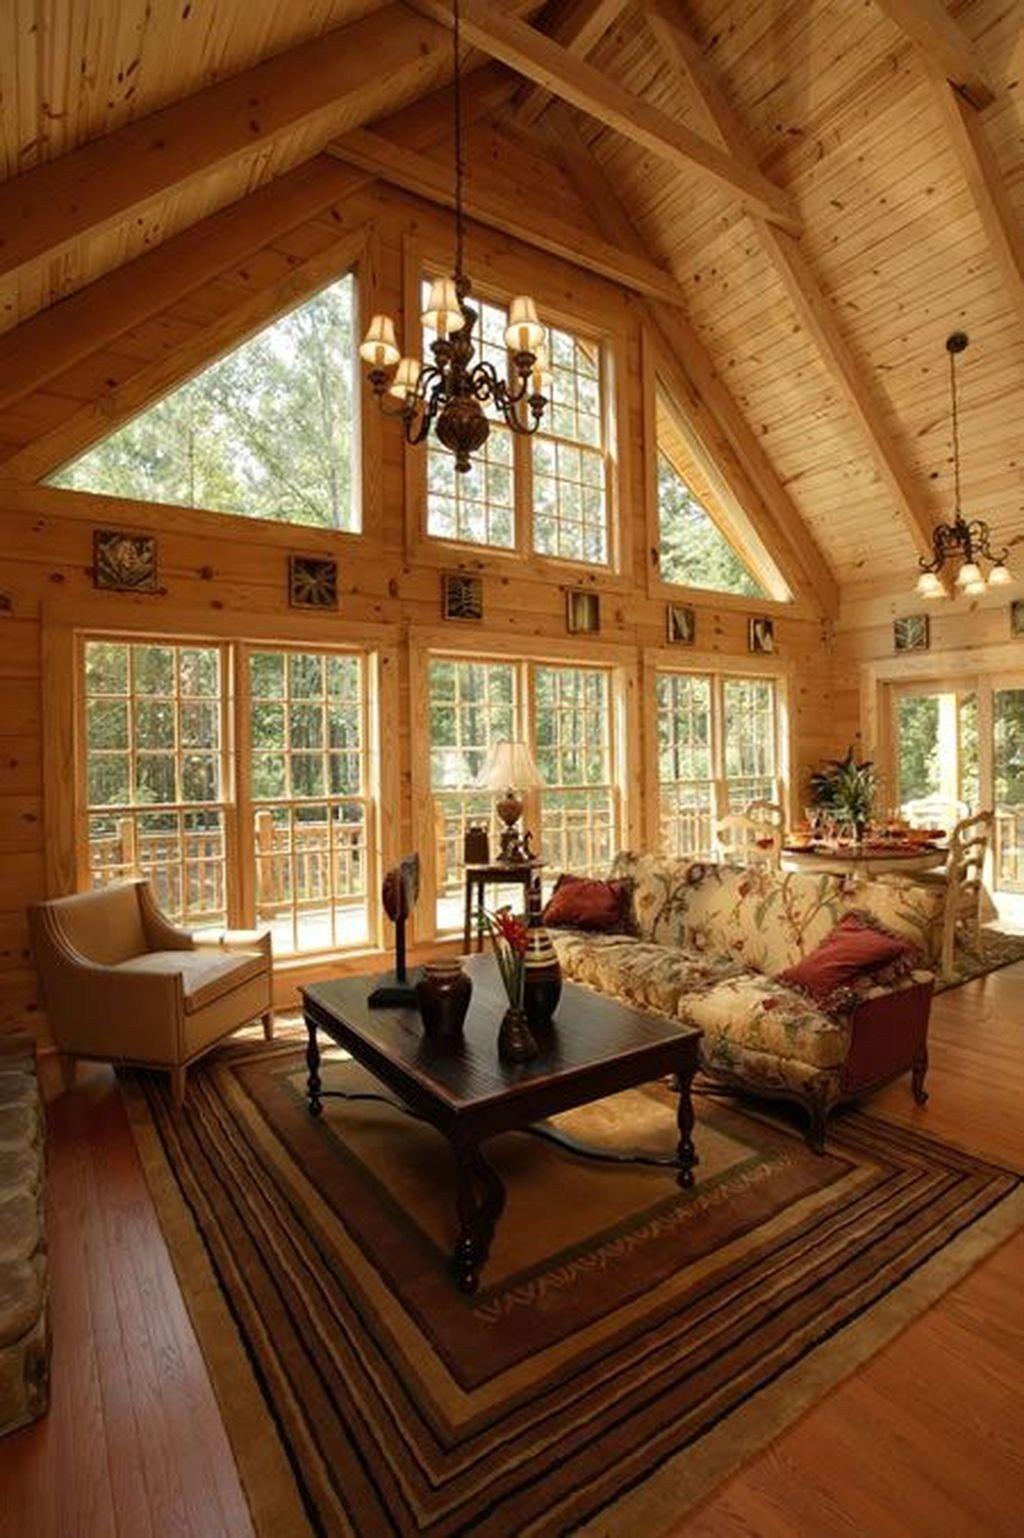 Amazing Lodge Living Room Decorating Ideas 24 Log home